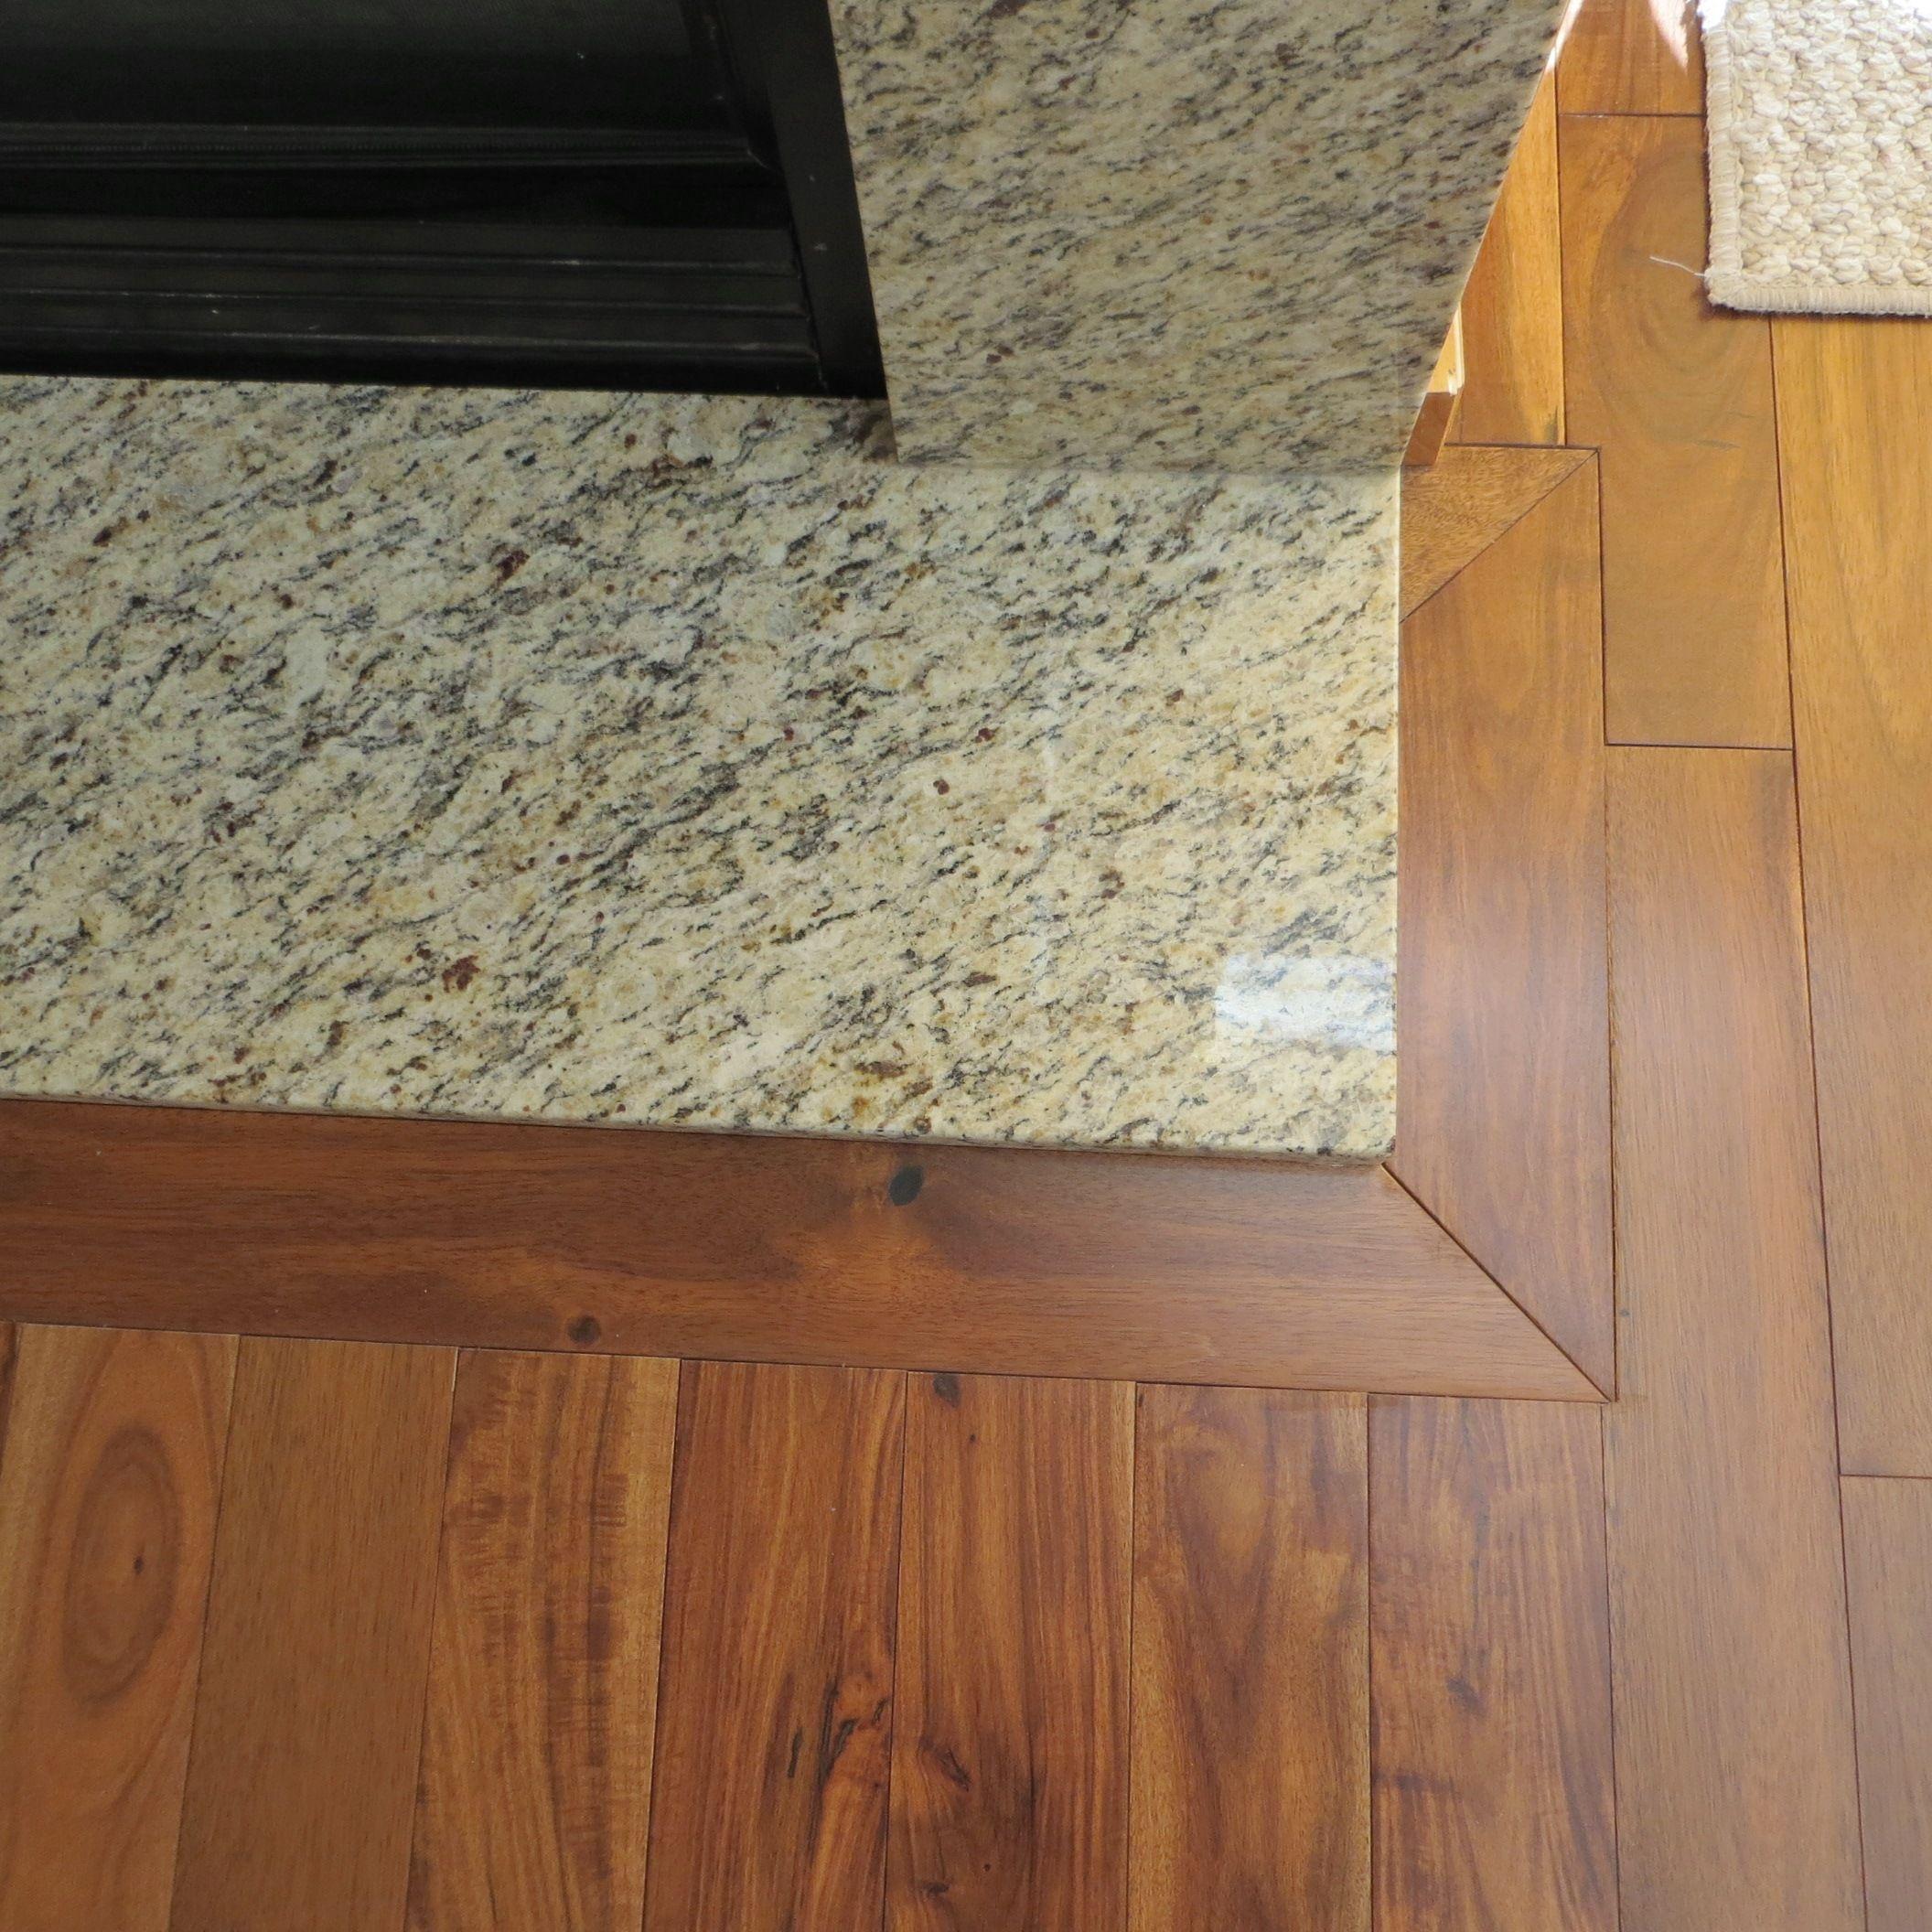 Fireplace Hearth Floor Molding Floor Trim Wood Floors